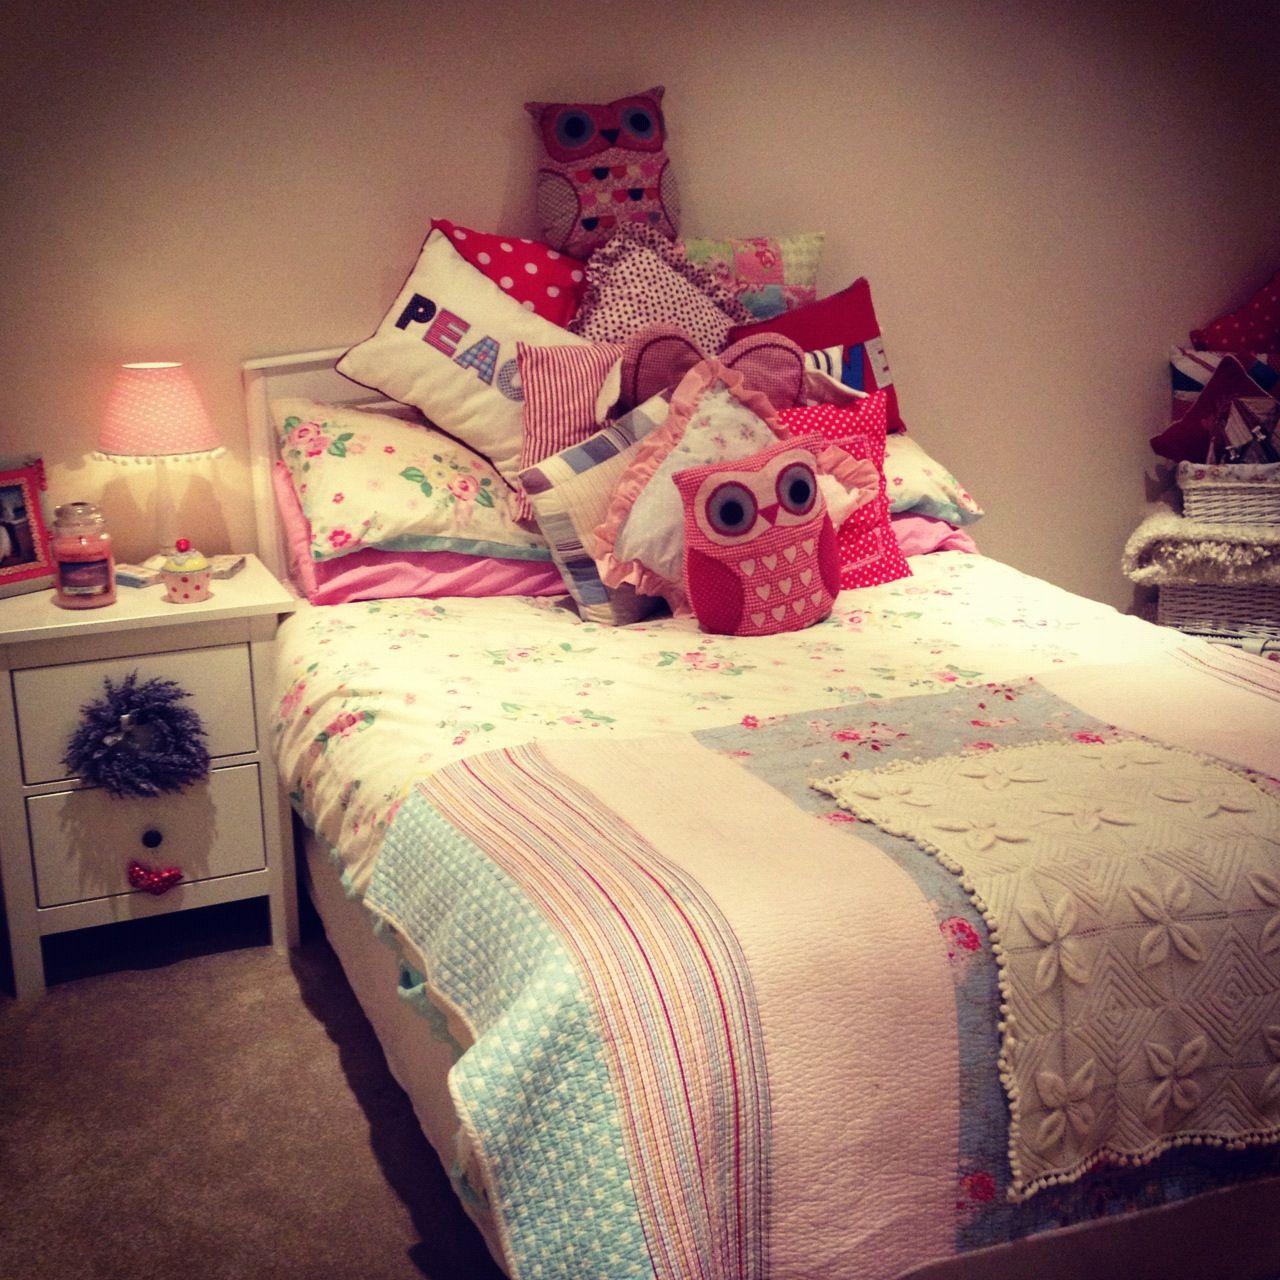 My room ❤